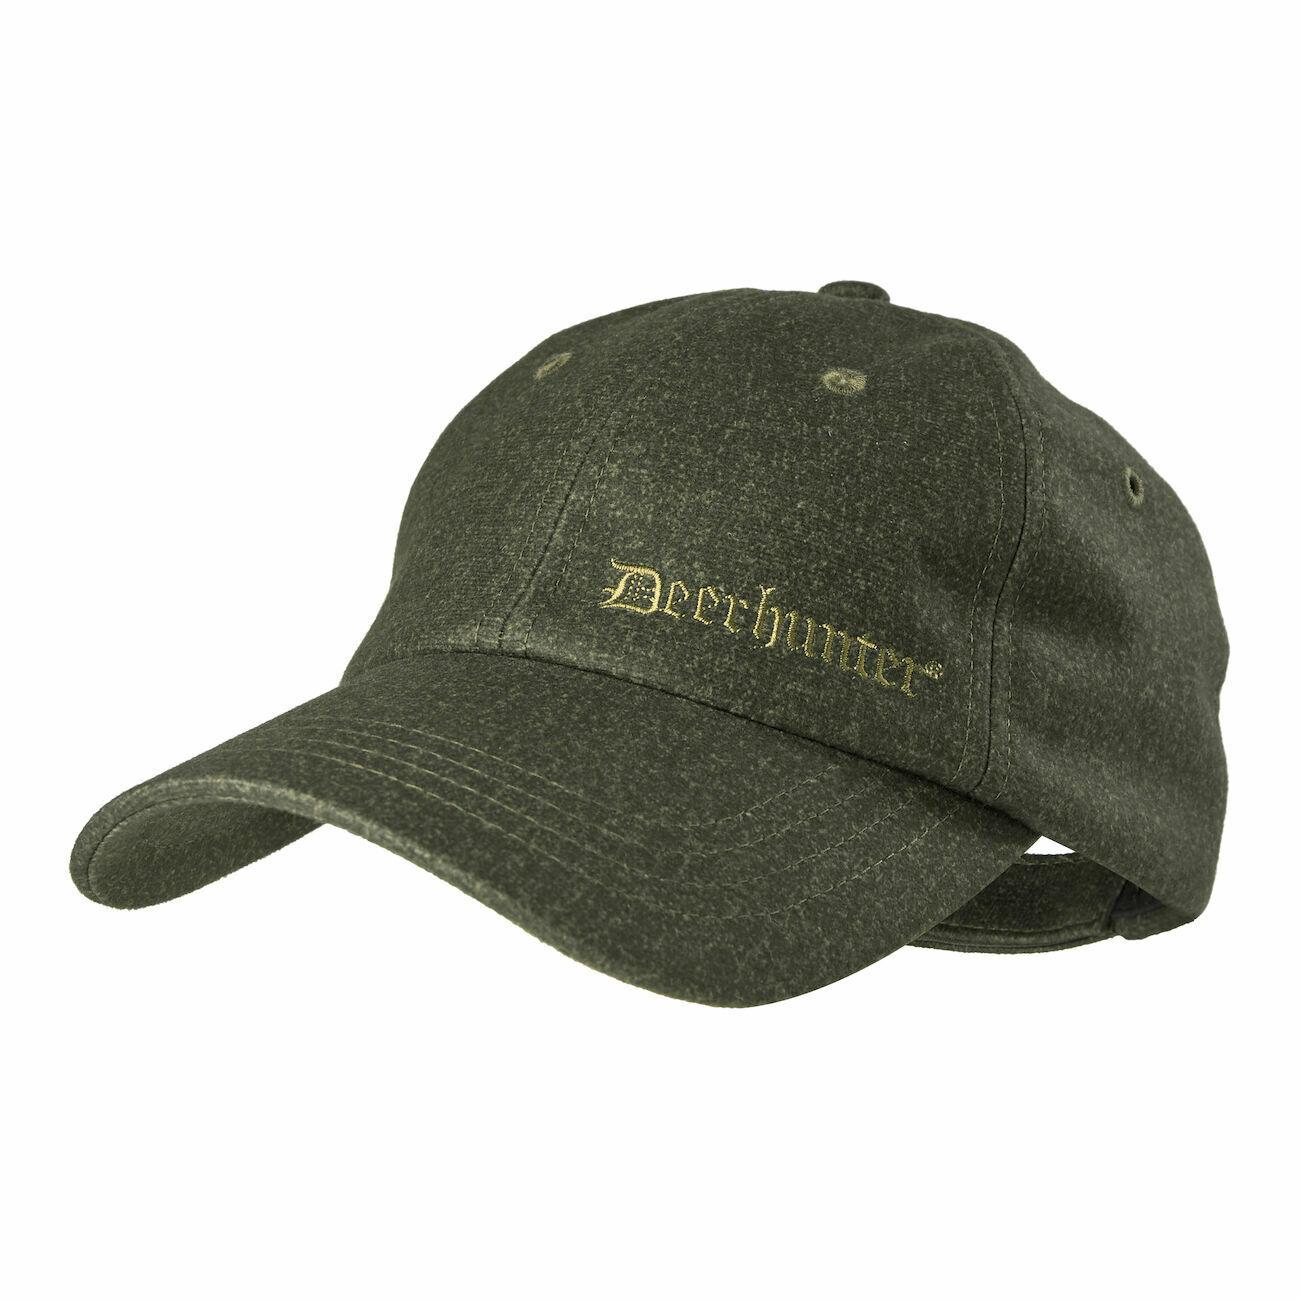 Deerhunter Ram Cap Cappy Schirm-Mütze Hut Baseball-Cap winddicht wasserabweisend